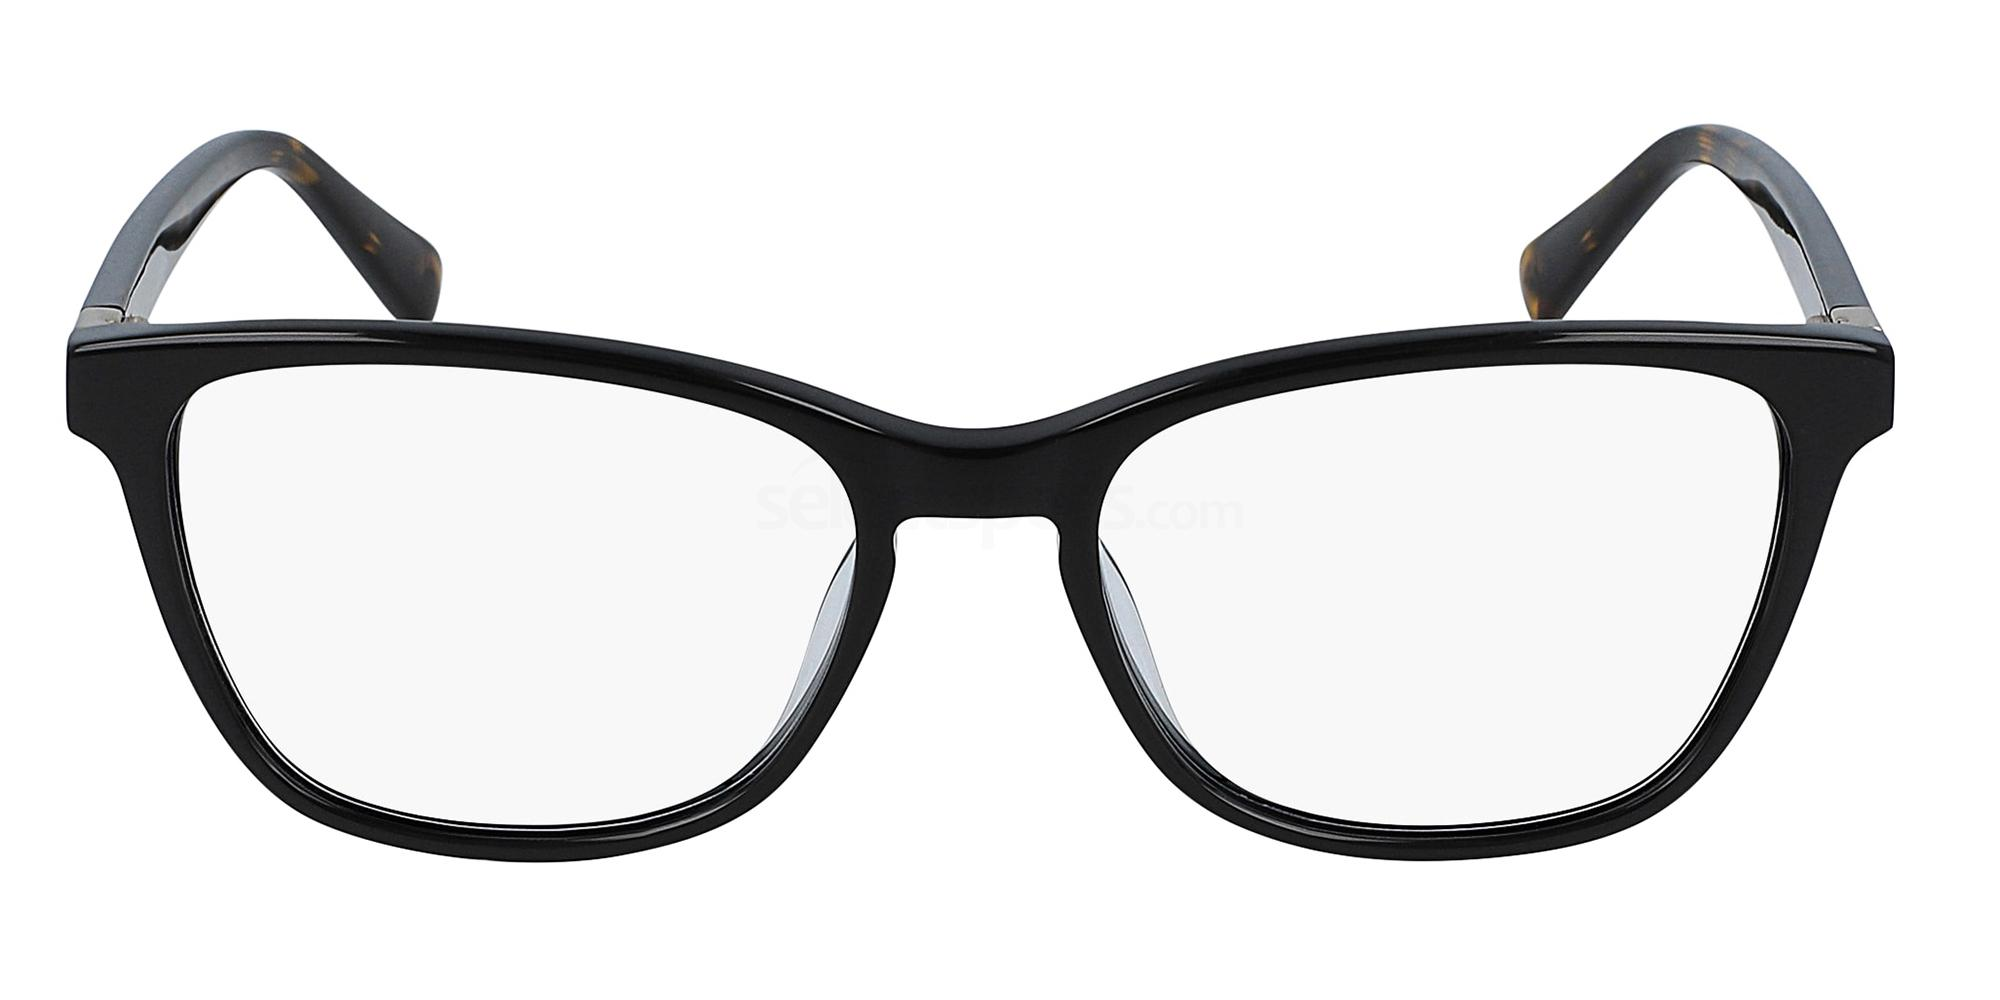 010 LO2647 Glasses, LONGCHAMP